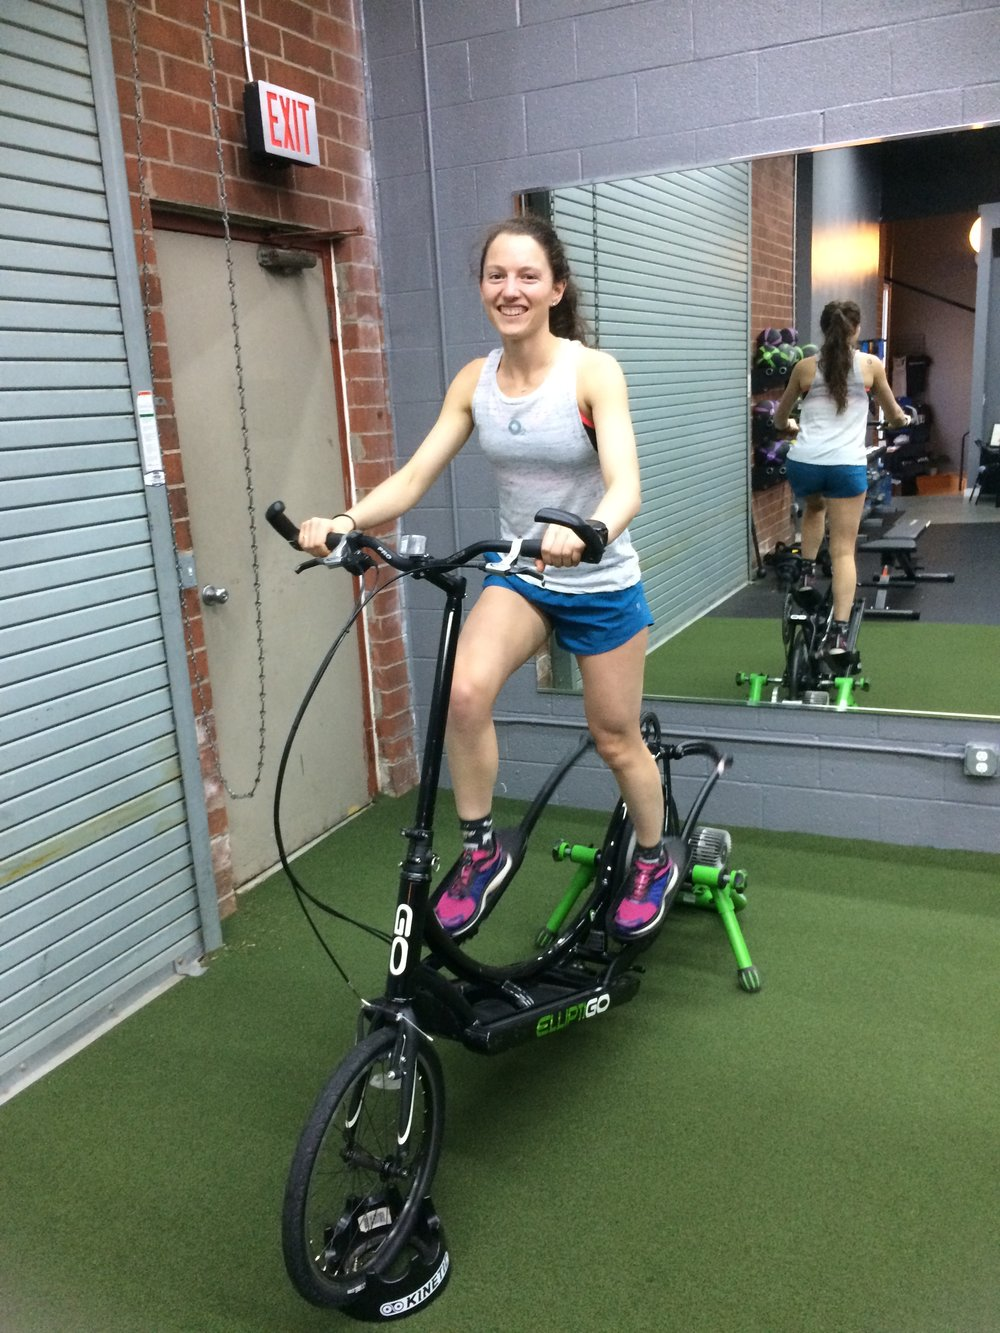 Erin on the ElliptiGO Trainer Post-Boston Marathon!